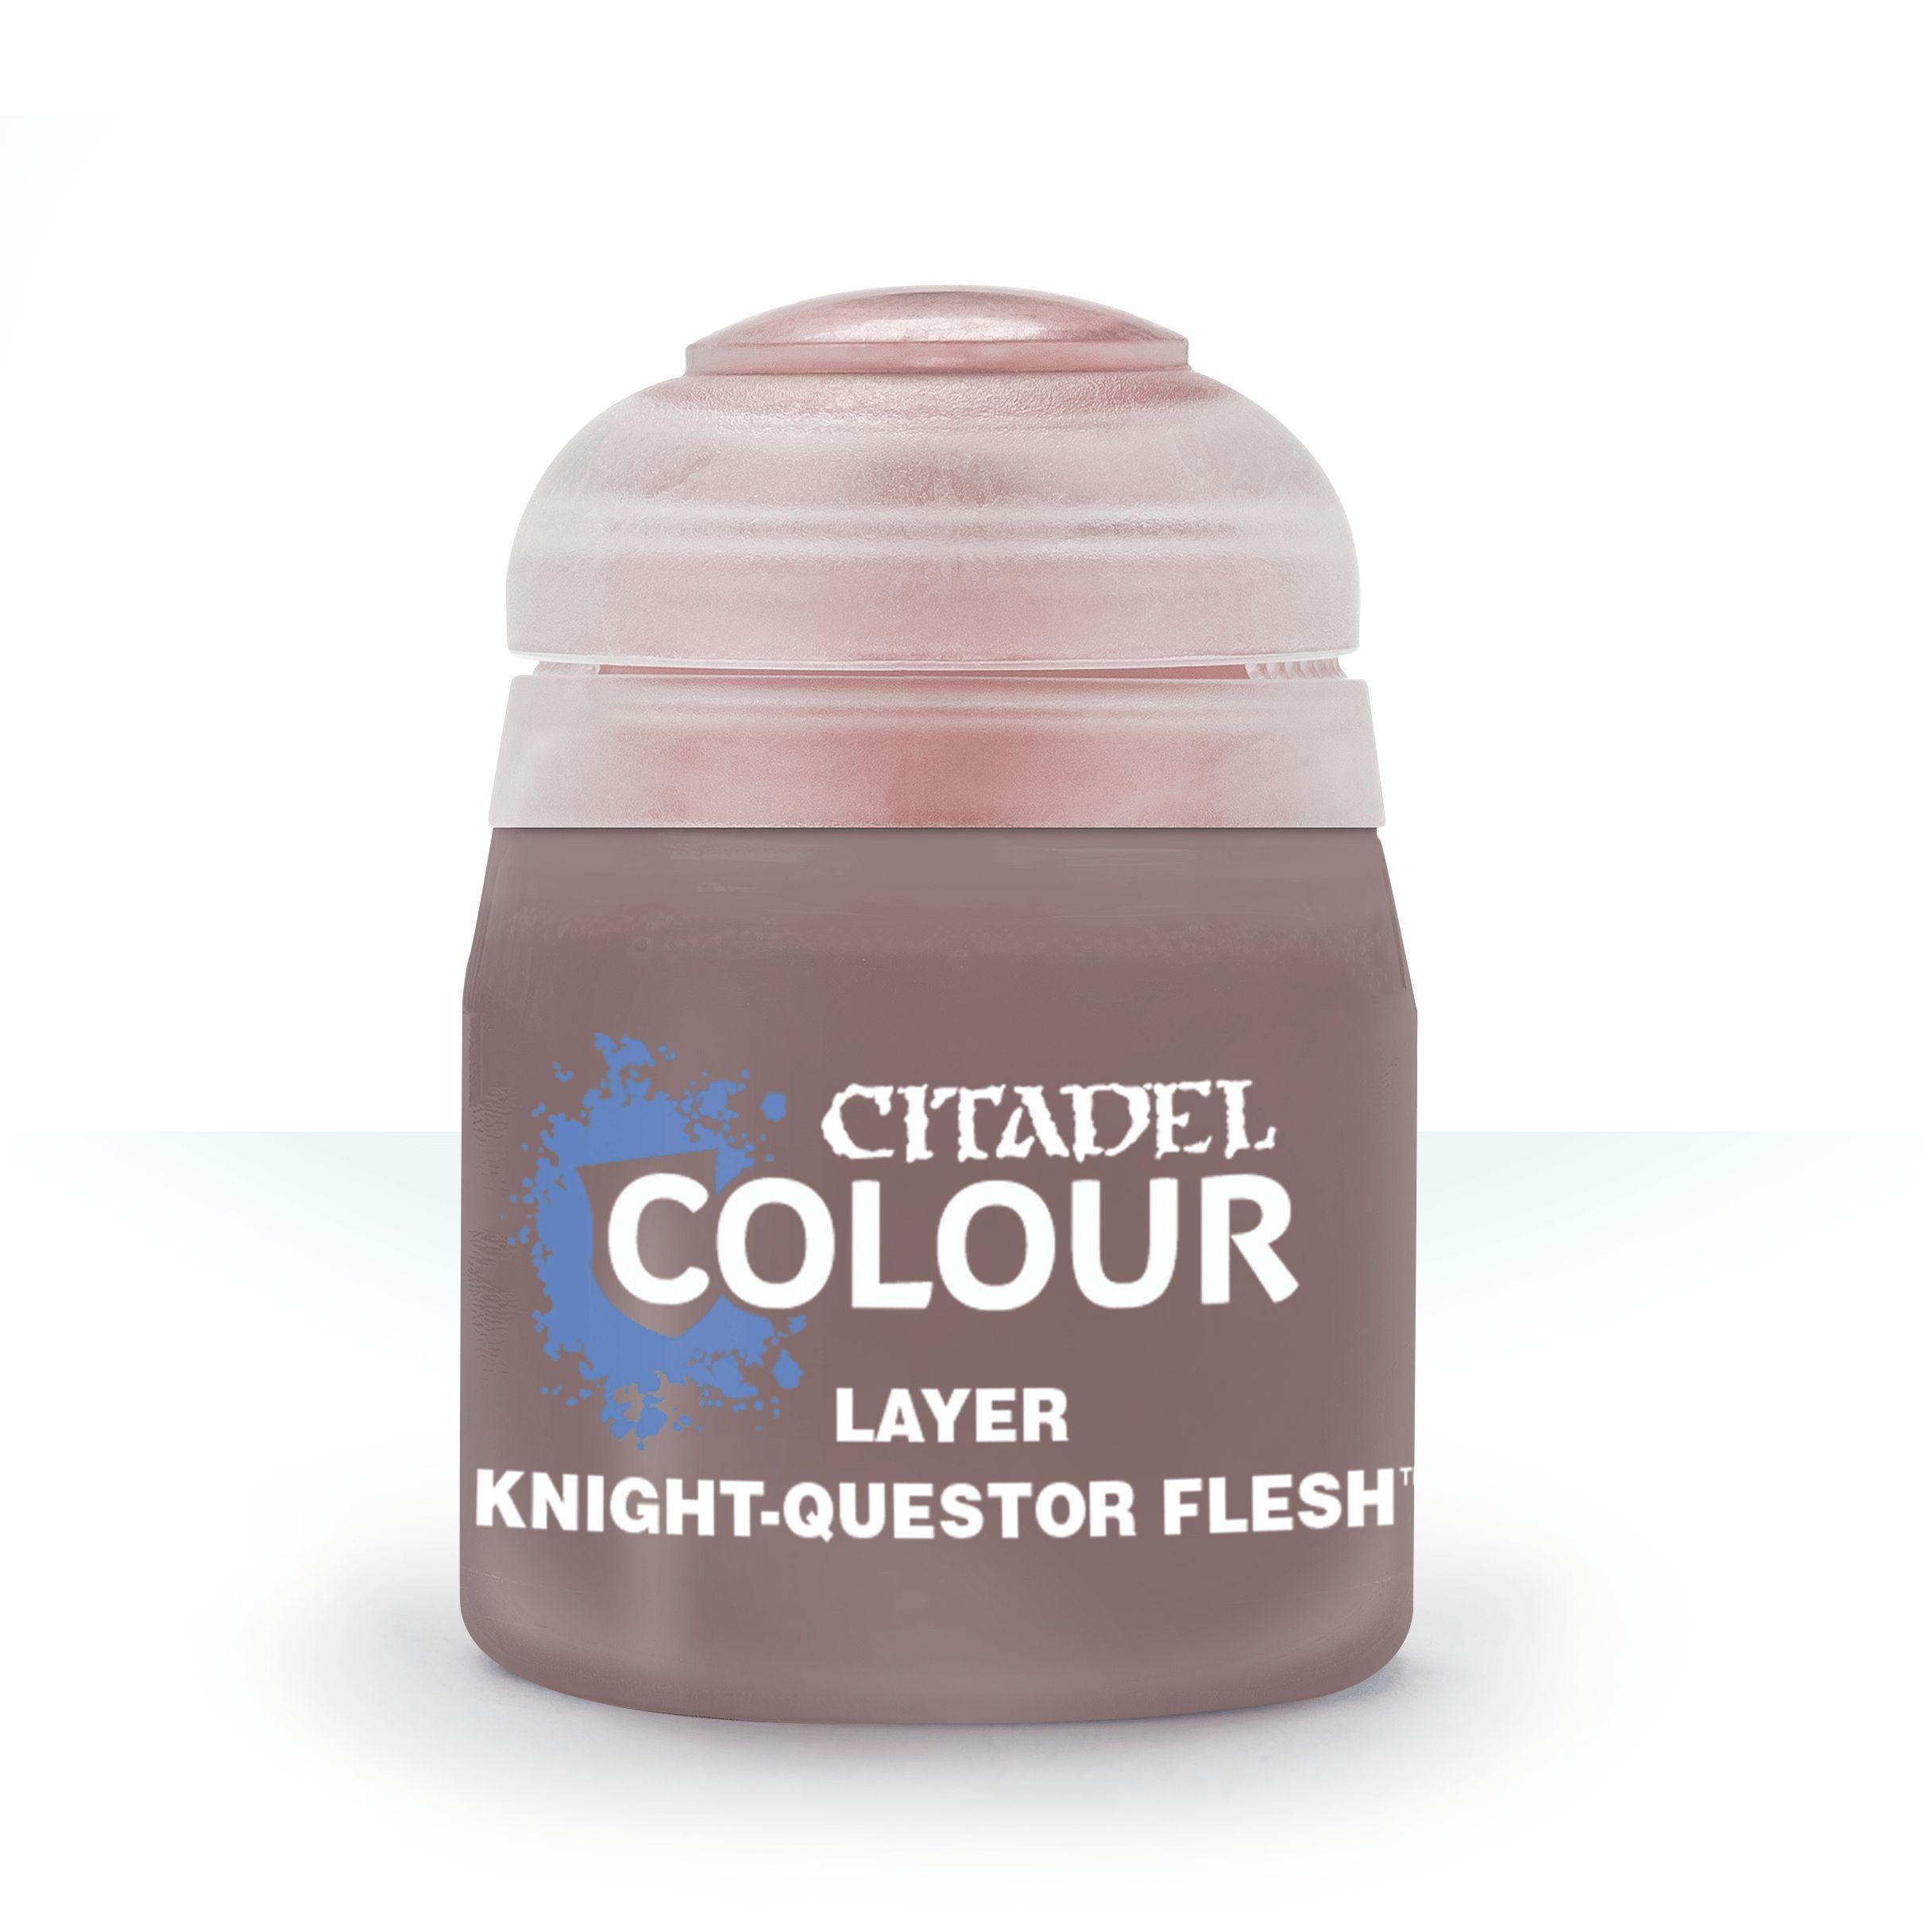 22-93 Layer Knight-Questor Flesh 12ml